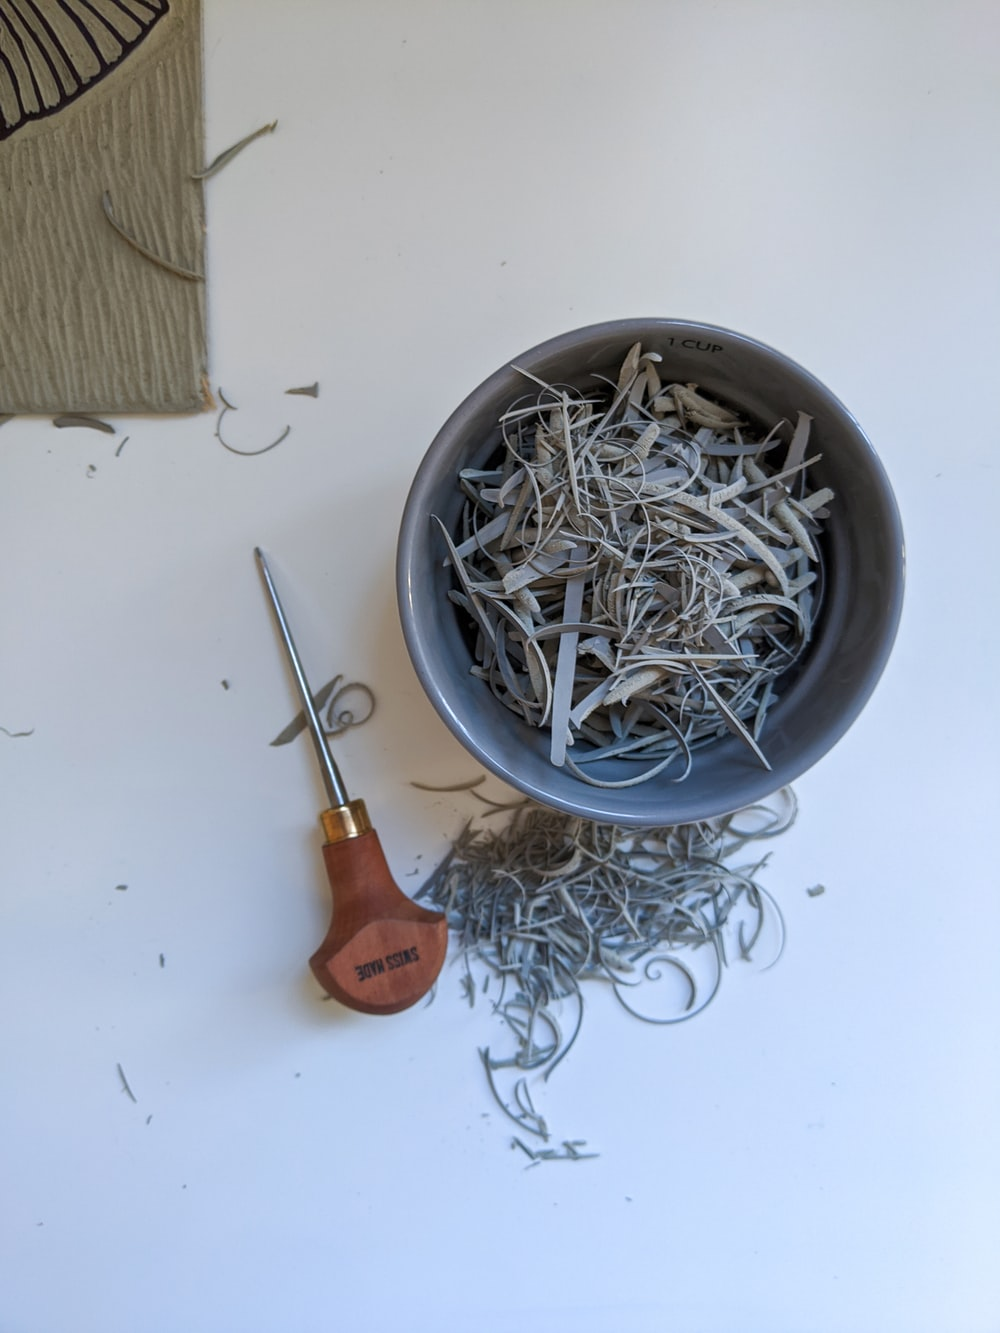 silver and orange handle scissors on gray round bowl